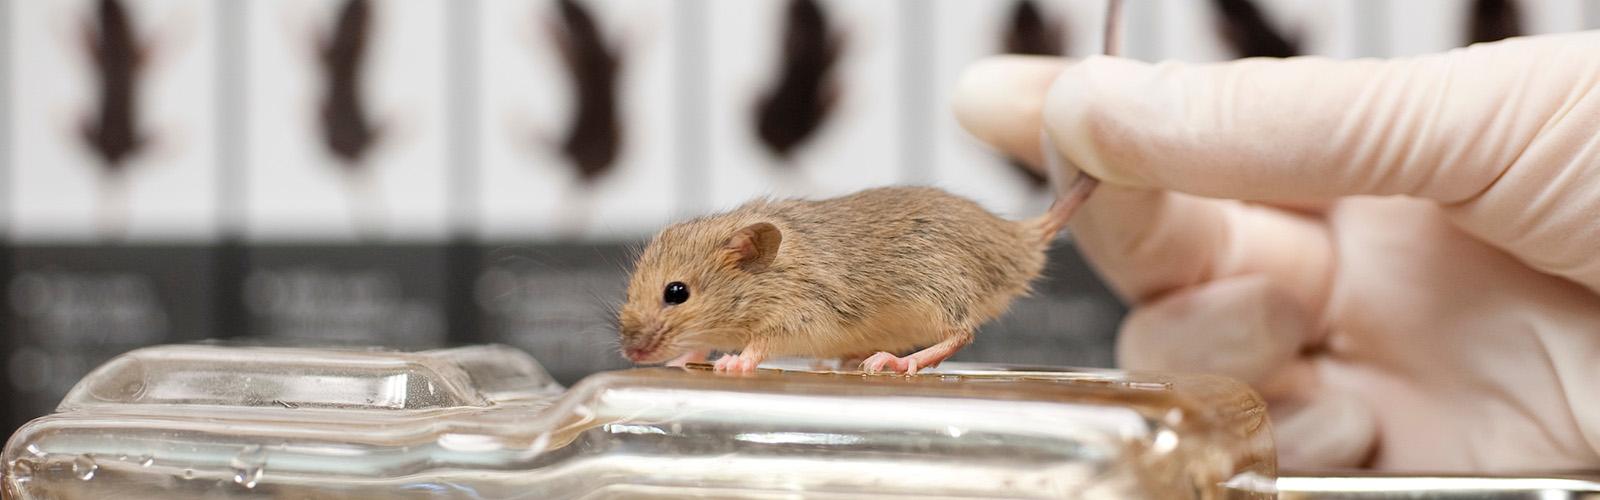 Rodent Models Core